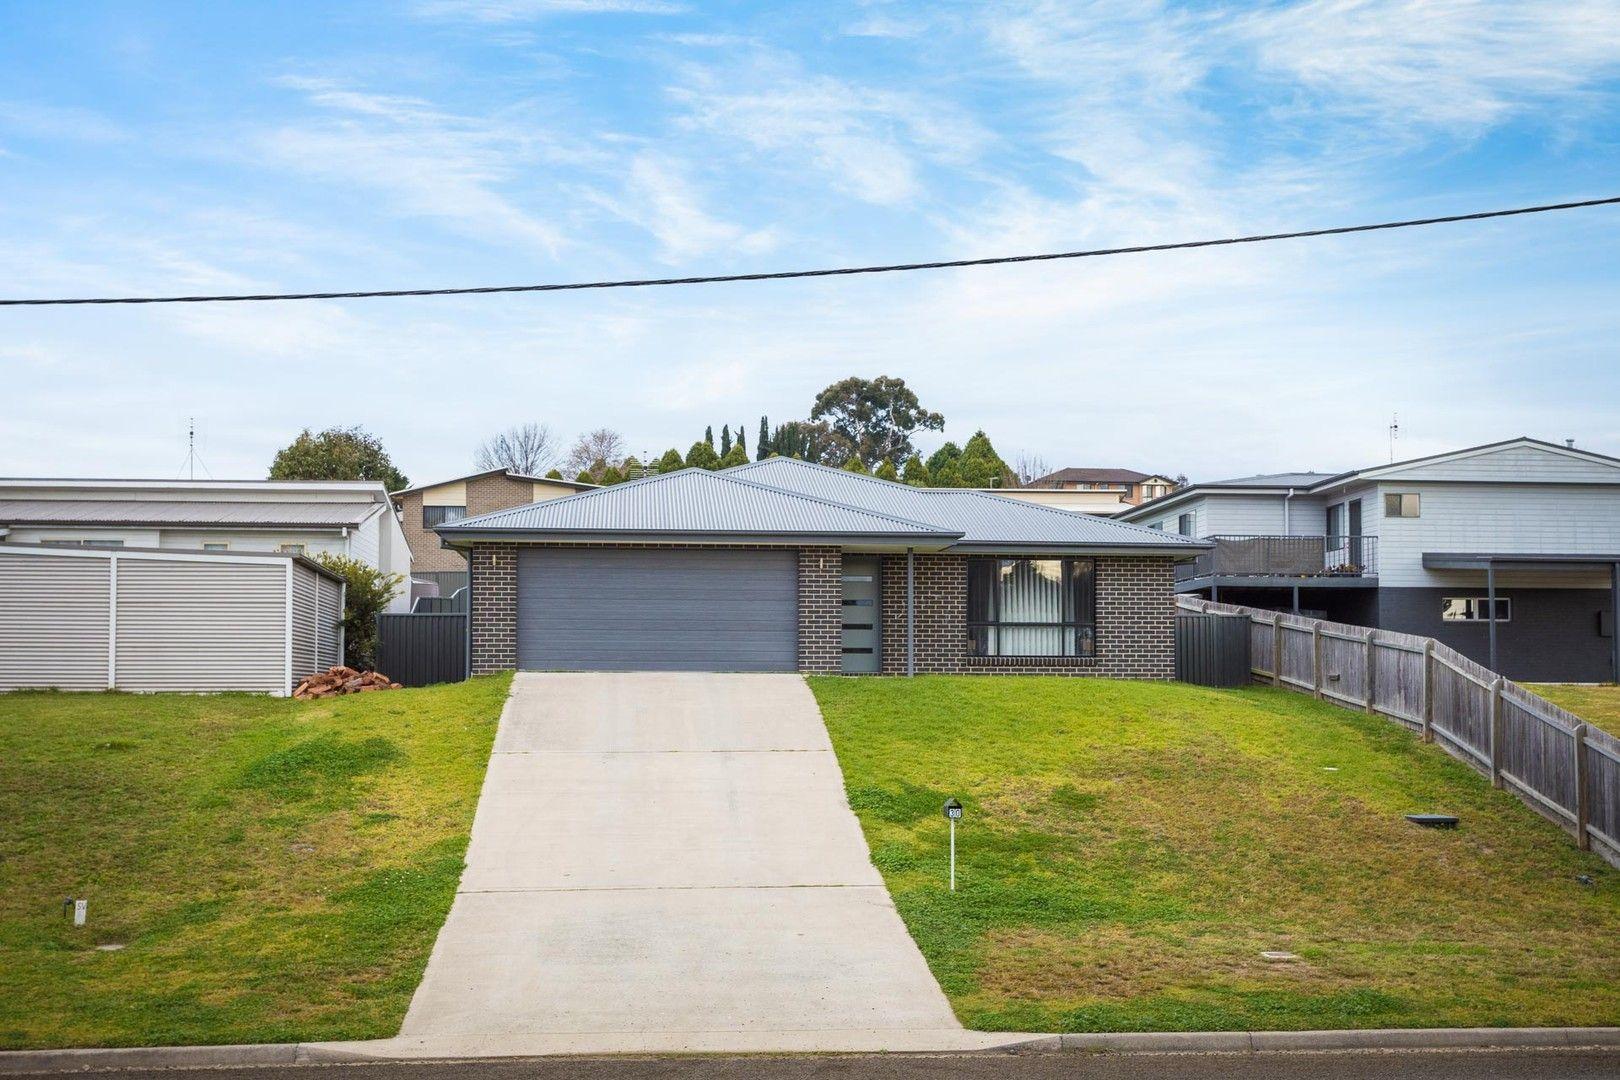 30 Rawlinson Street, Bega NSW 2550, Image 0